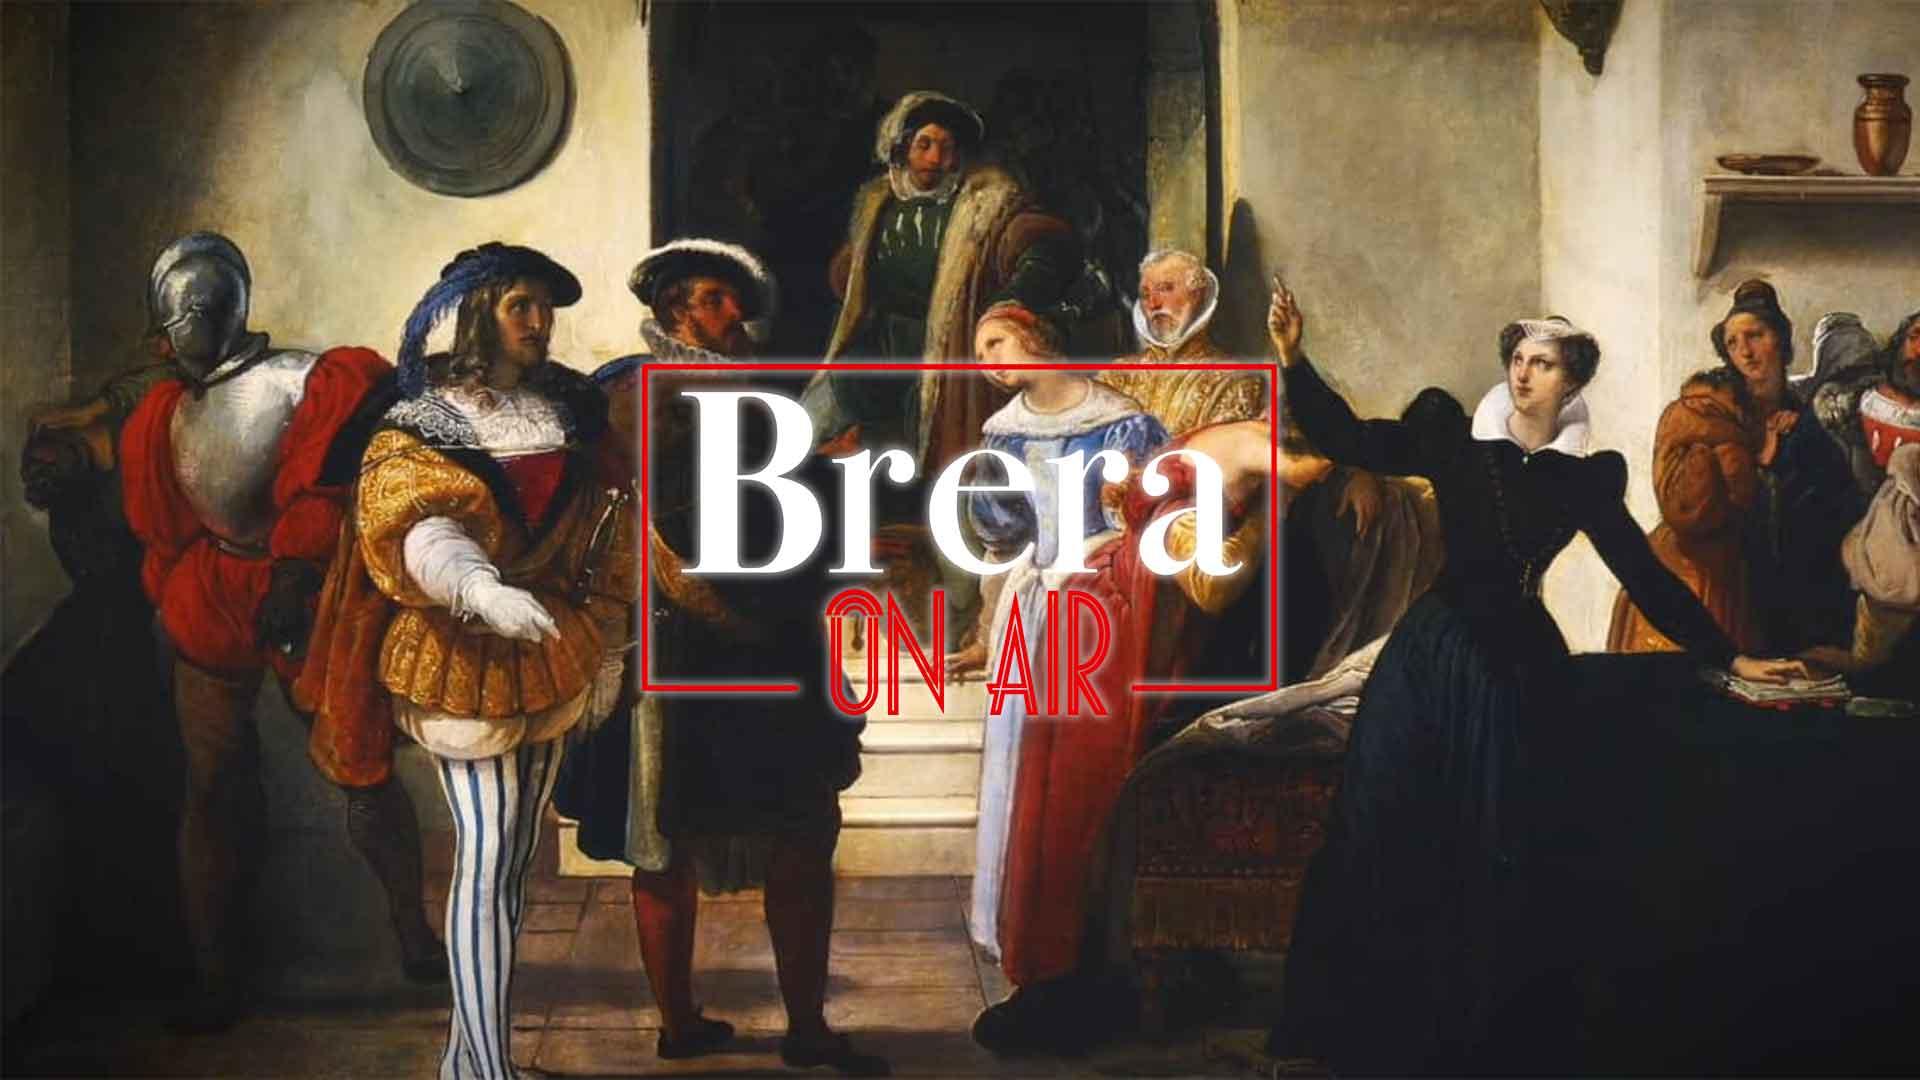 Nei depositi della Pinacoteca con <em>Brera on Air</em>